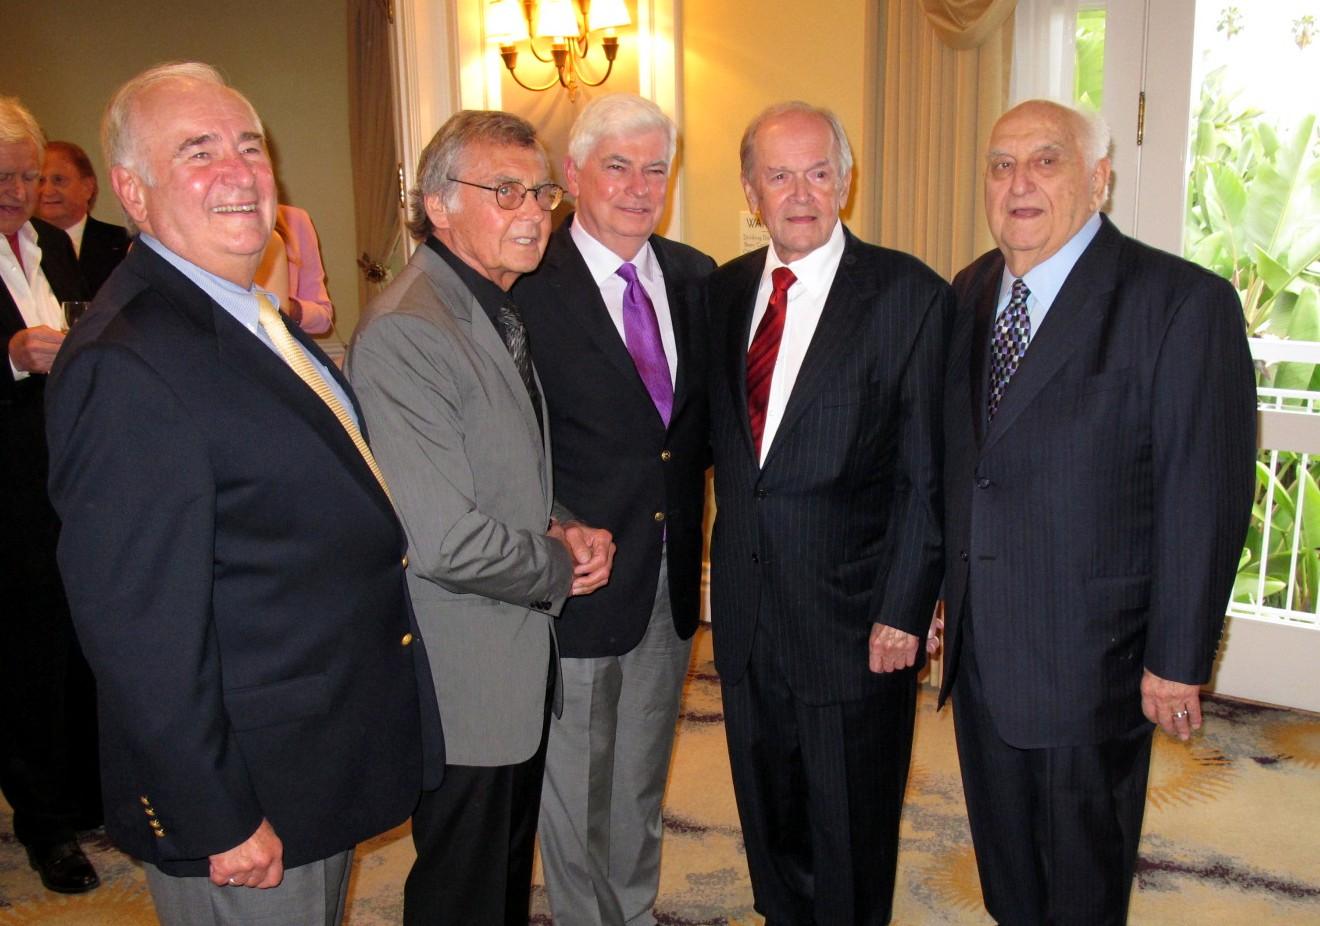 Dennis Doty, Norman Powell, Senator Christopher Dodd, Frank Price, Chuck Fries, 9TH ANNUAL AMERICAN SPIRIT AWARDS Beverly Hills Hotel